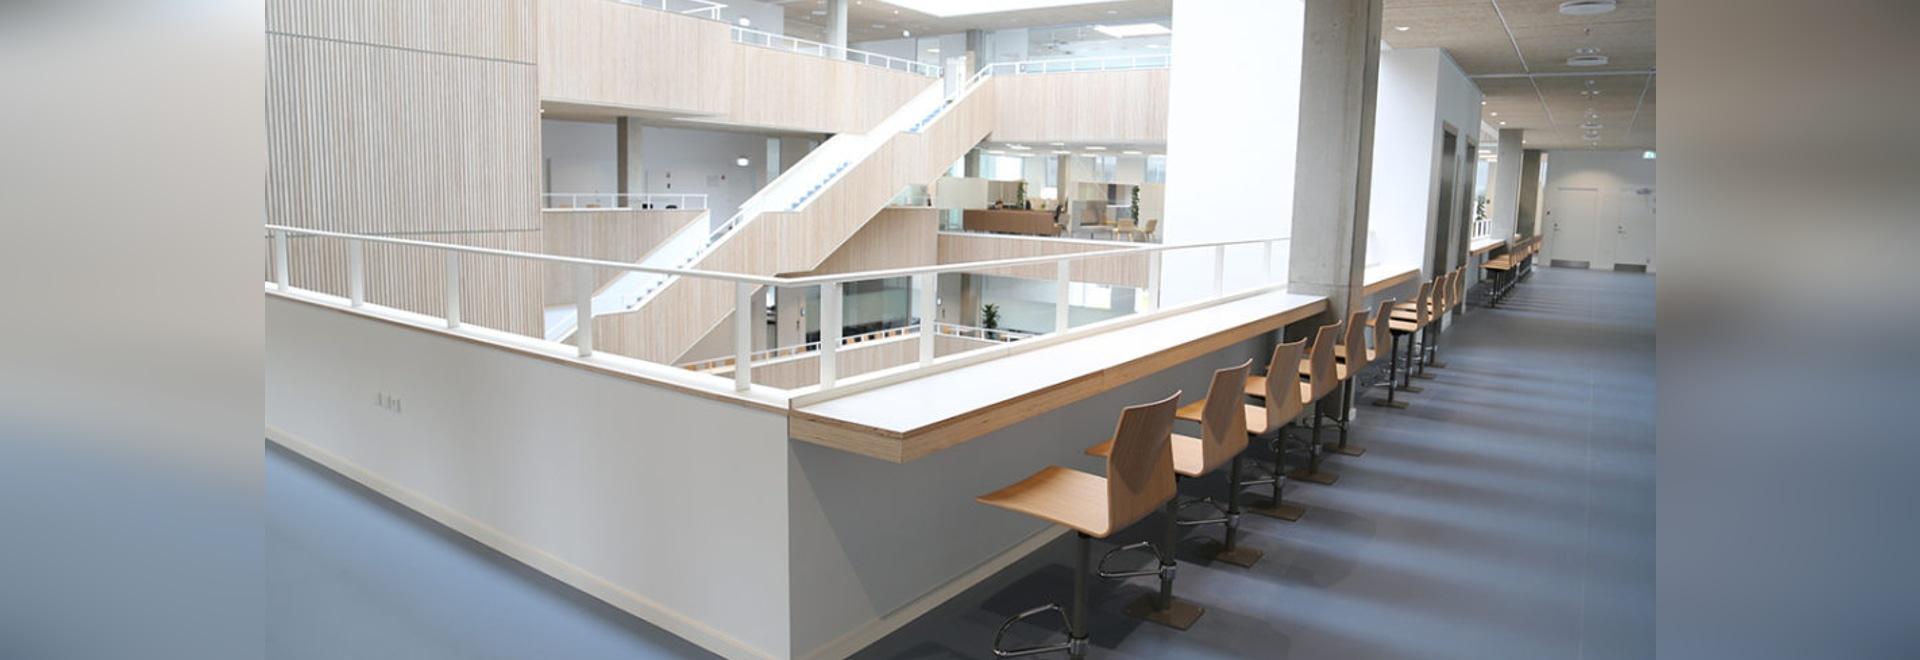 Académie de Lillebaelt